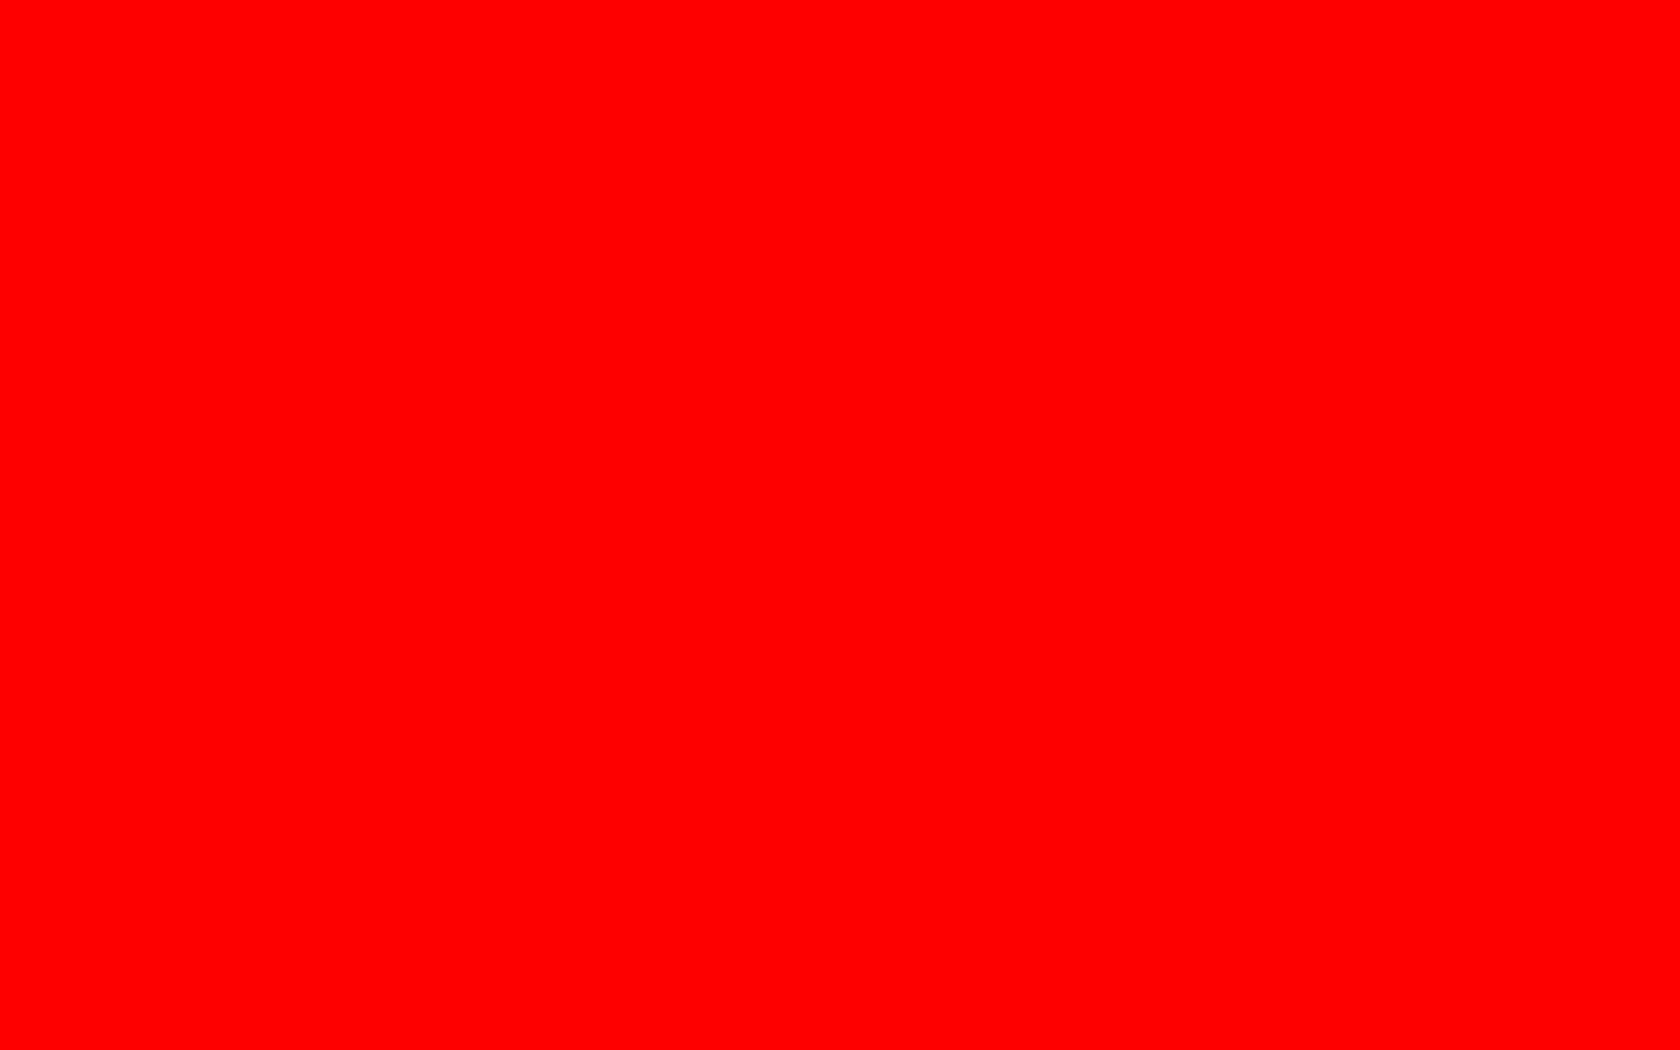 Crveno